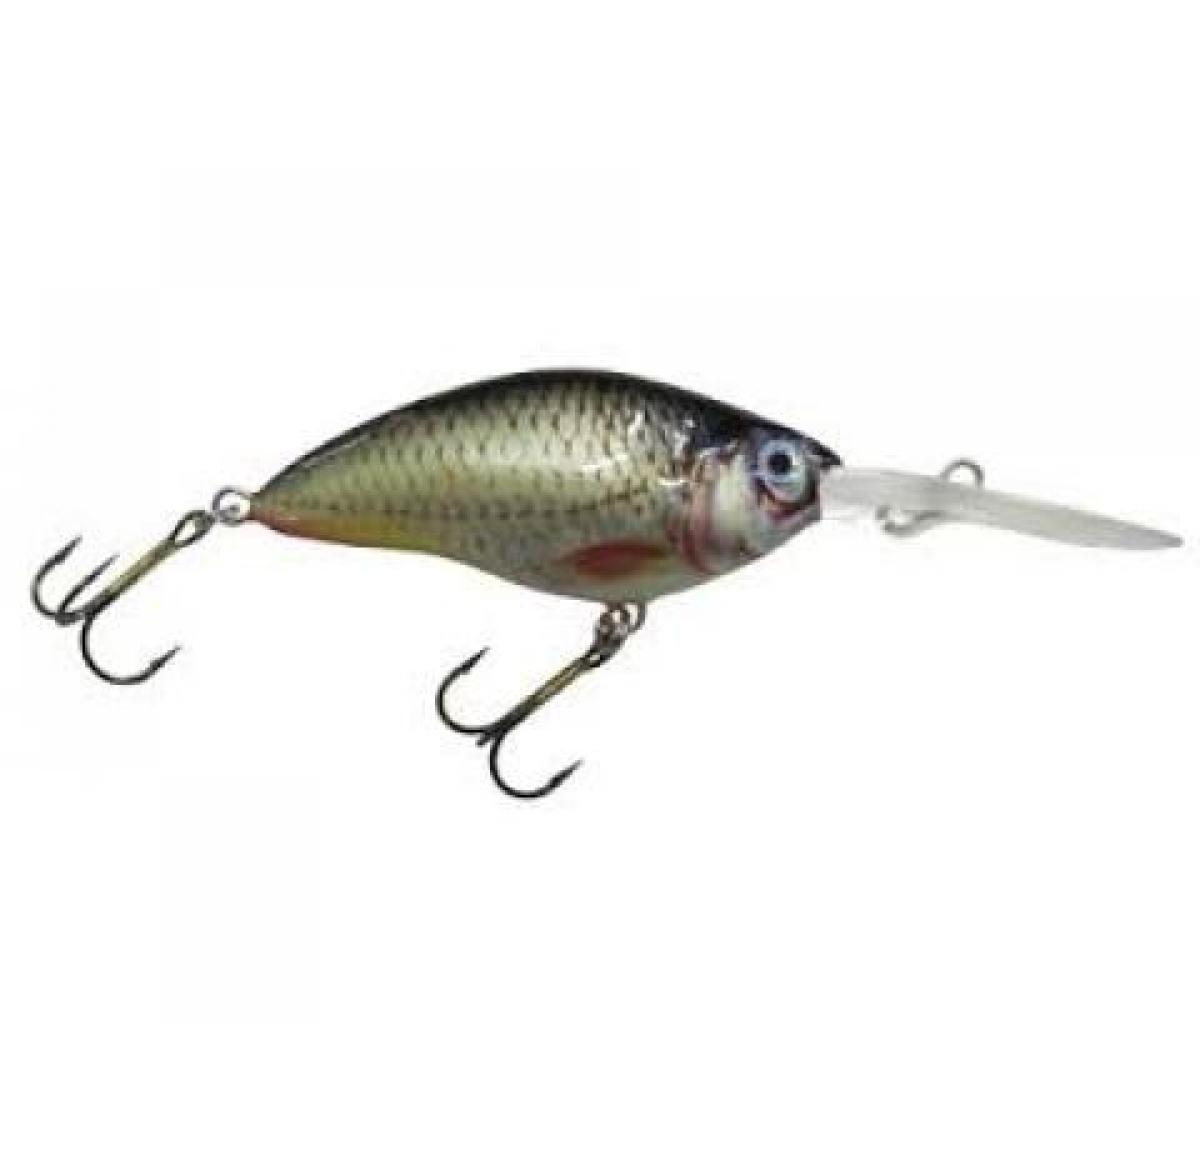 HRT Lures Crank Floater 7cm 15g 1.5-4.0m 235